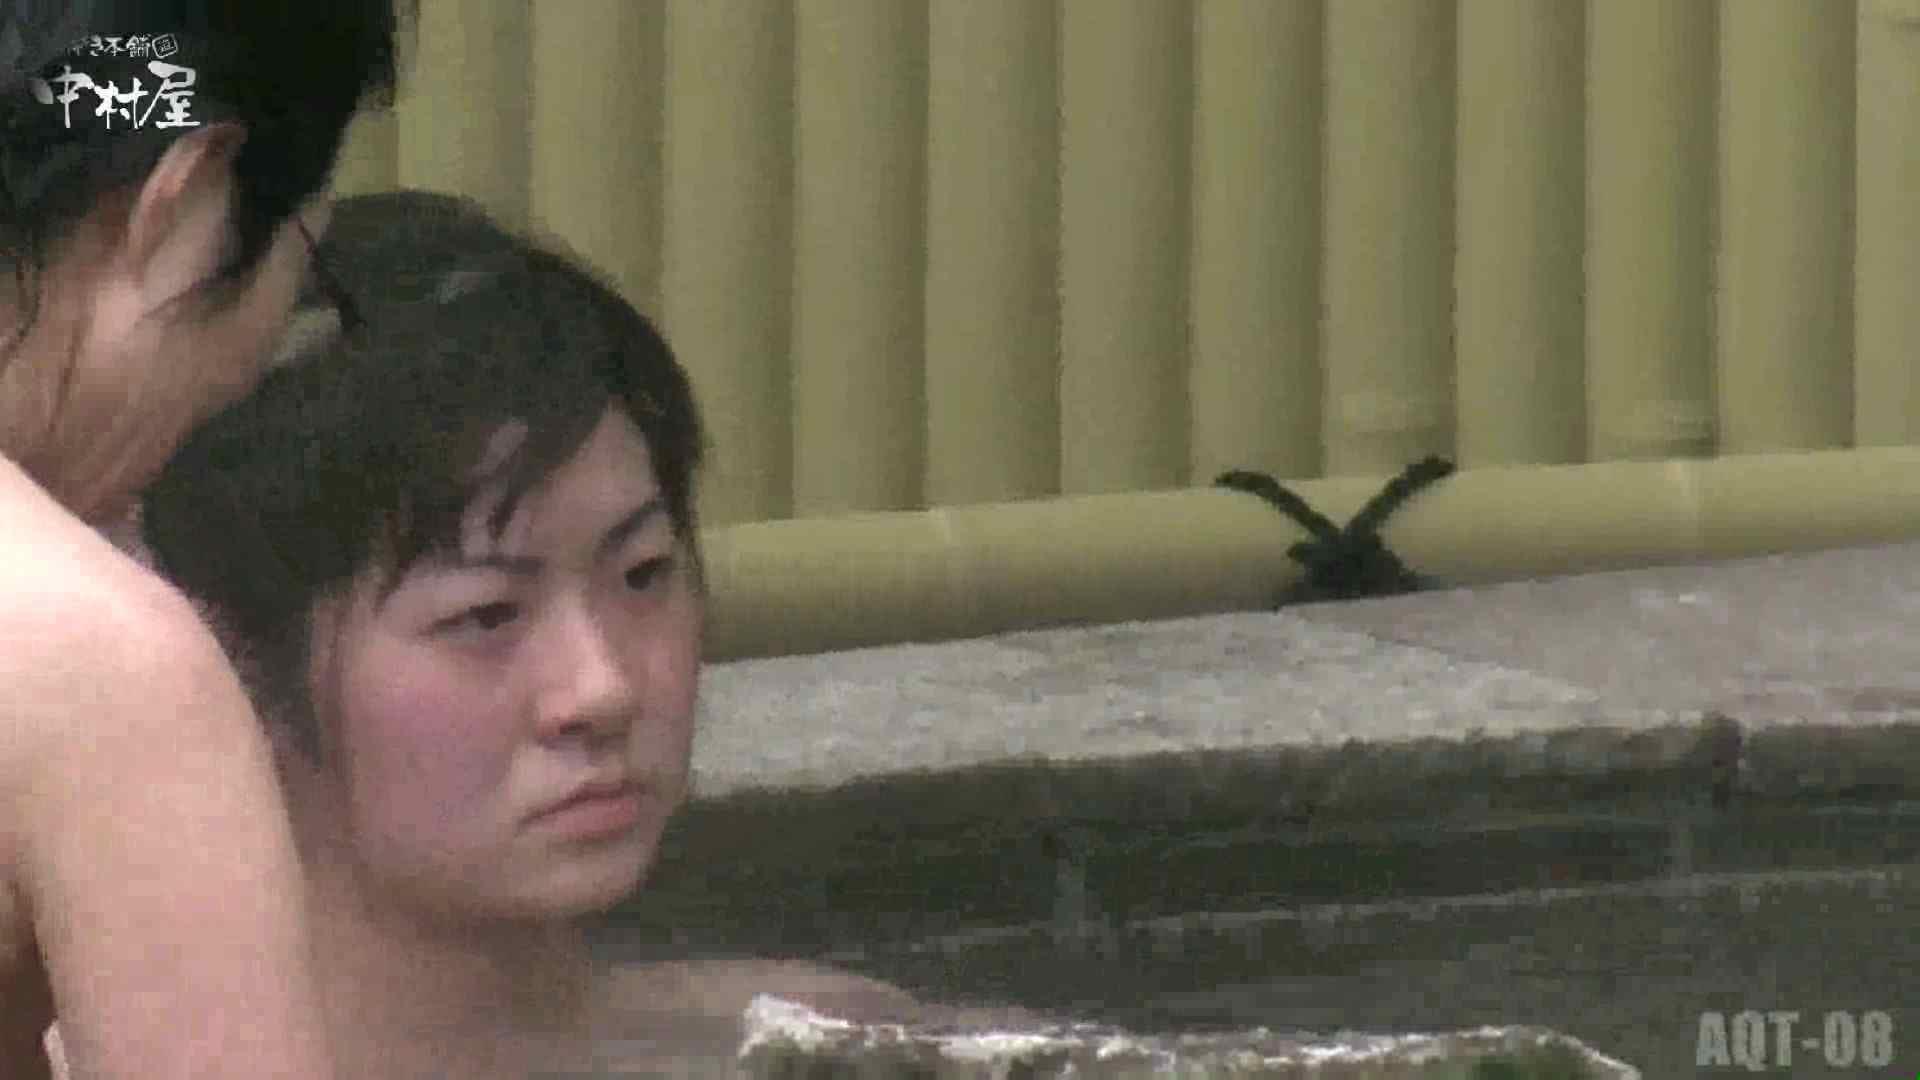 Aquaな露天風呂Vol.872潜入盗撮露天風呂八判湯 其の二 露天風呂 | 潜入  70連発 65